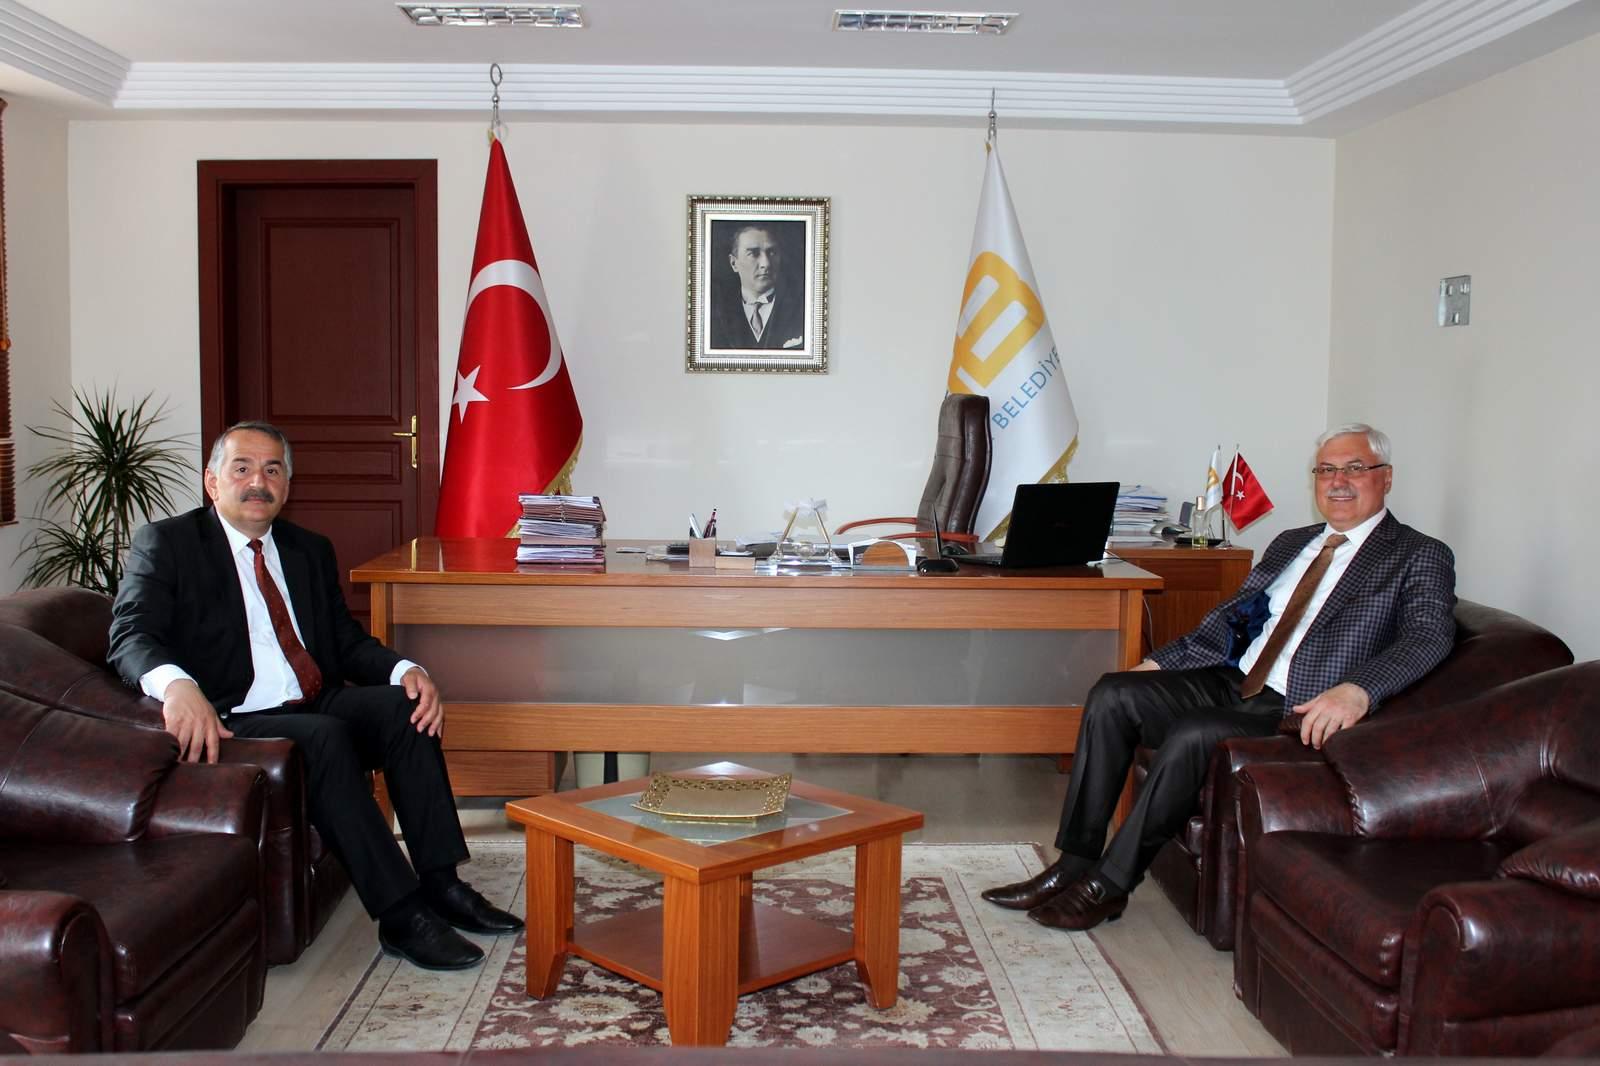 Mustafa Ak Başkan Karakulukçu'yu Ziyaret Etti…